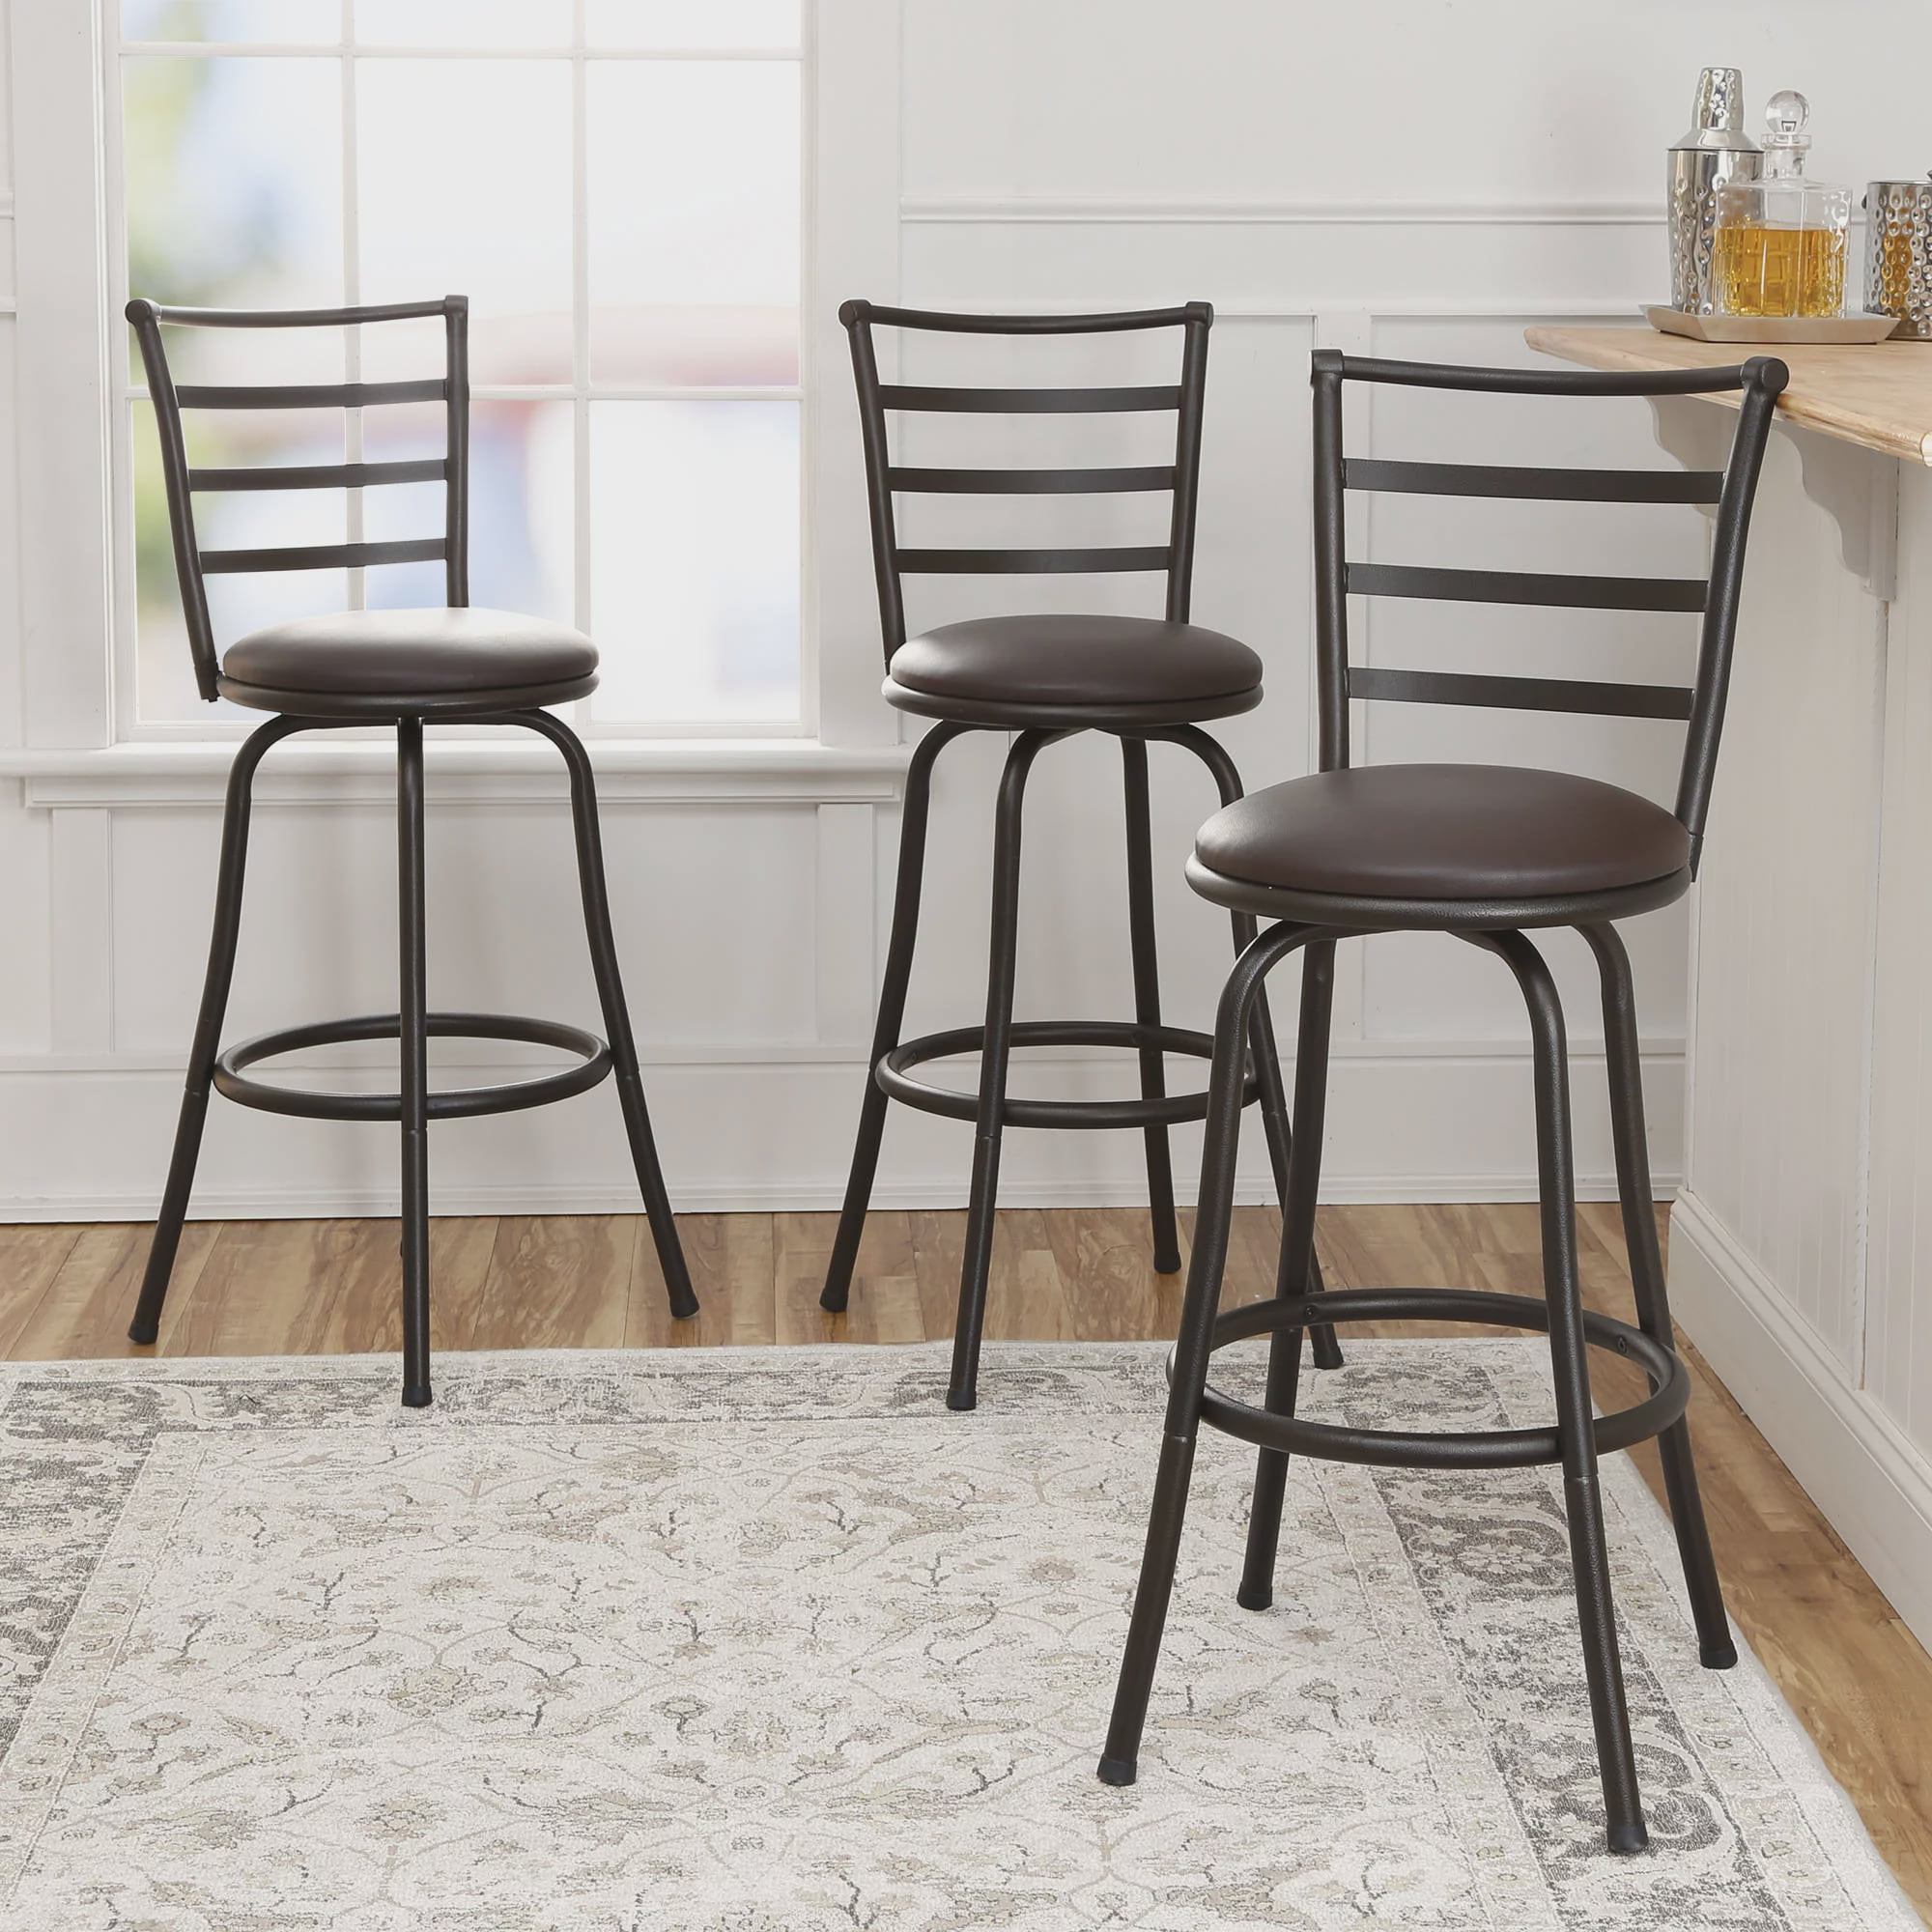 new mainstays adjustable height swivel bar stool set of 3 metal brown chairs ebay. Black Bedroom Furniture Sets. Home Design Ideas